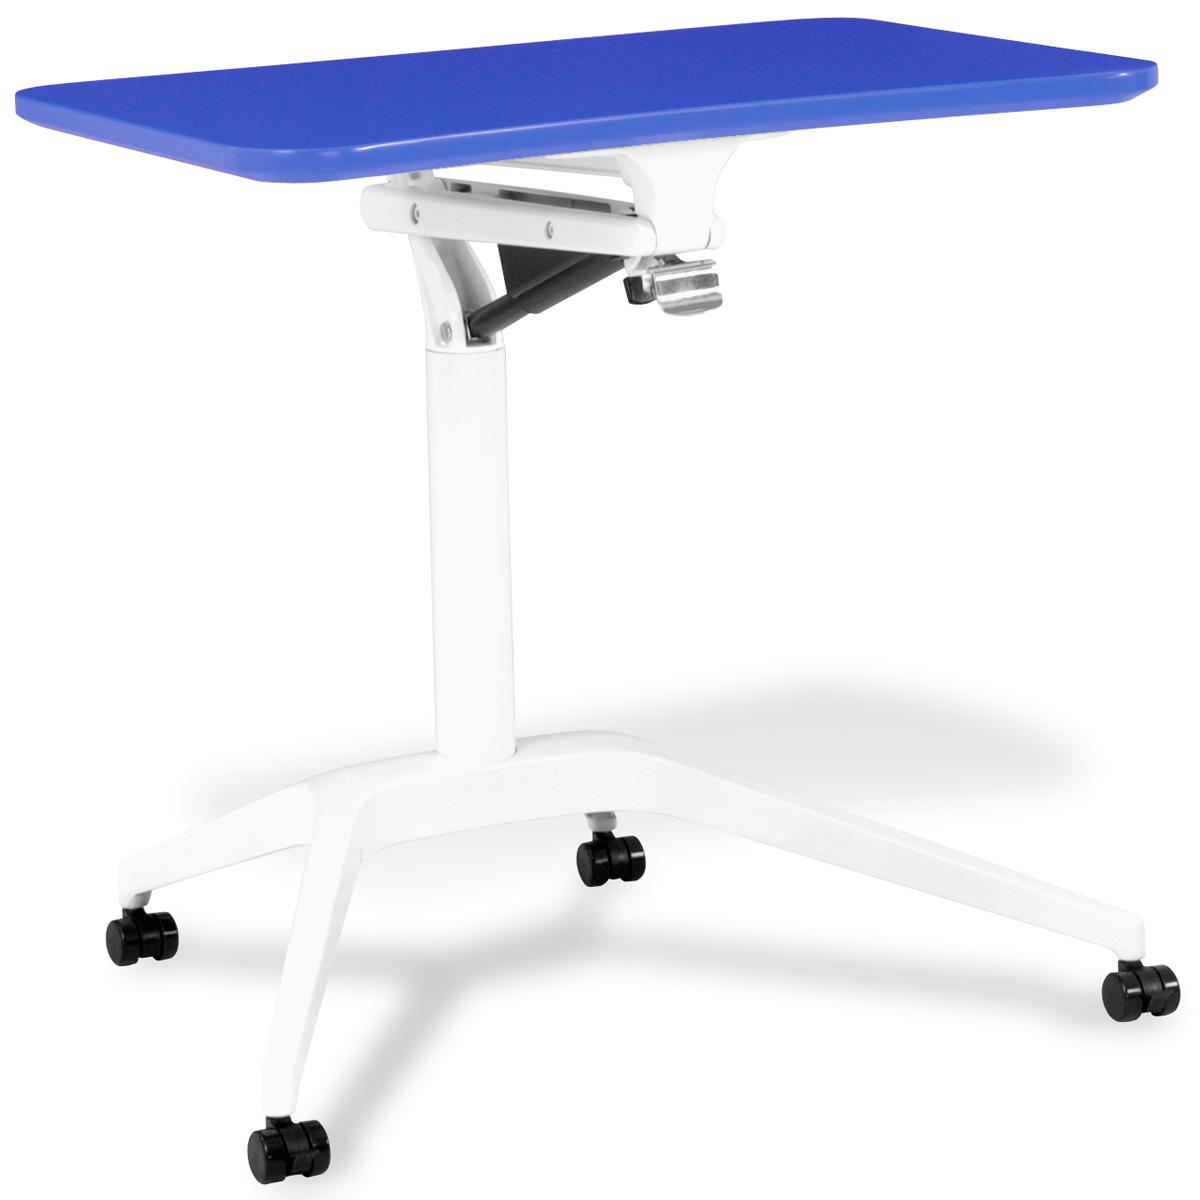 Mobile Laptop Table   Adjustable Height, Blue   UNIQ X201 BLUE ...